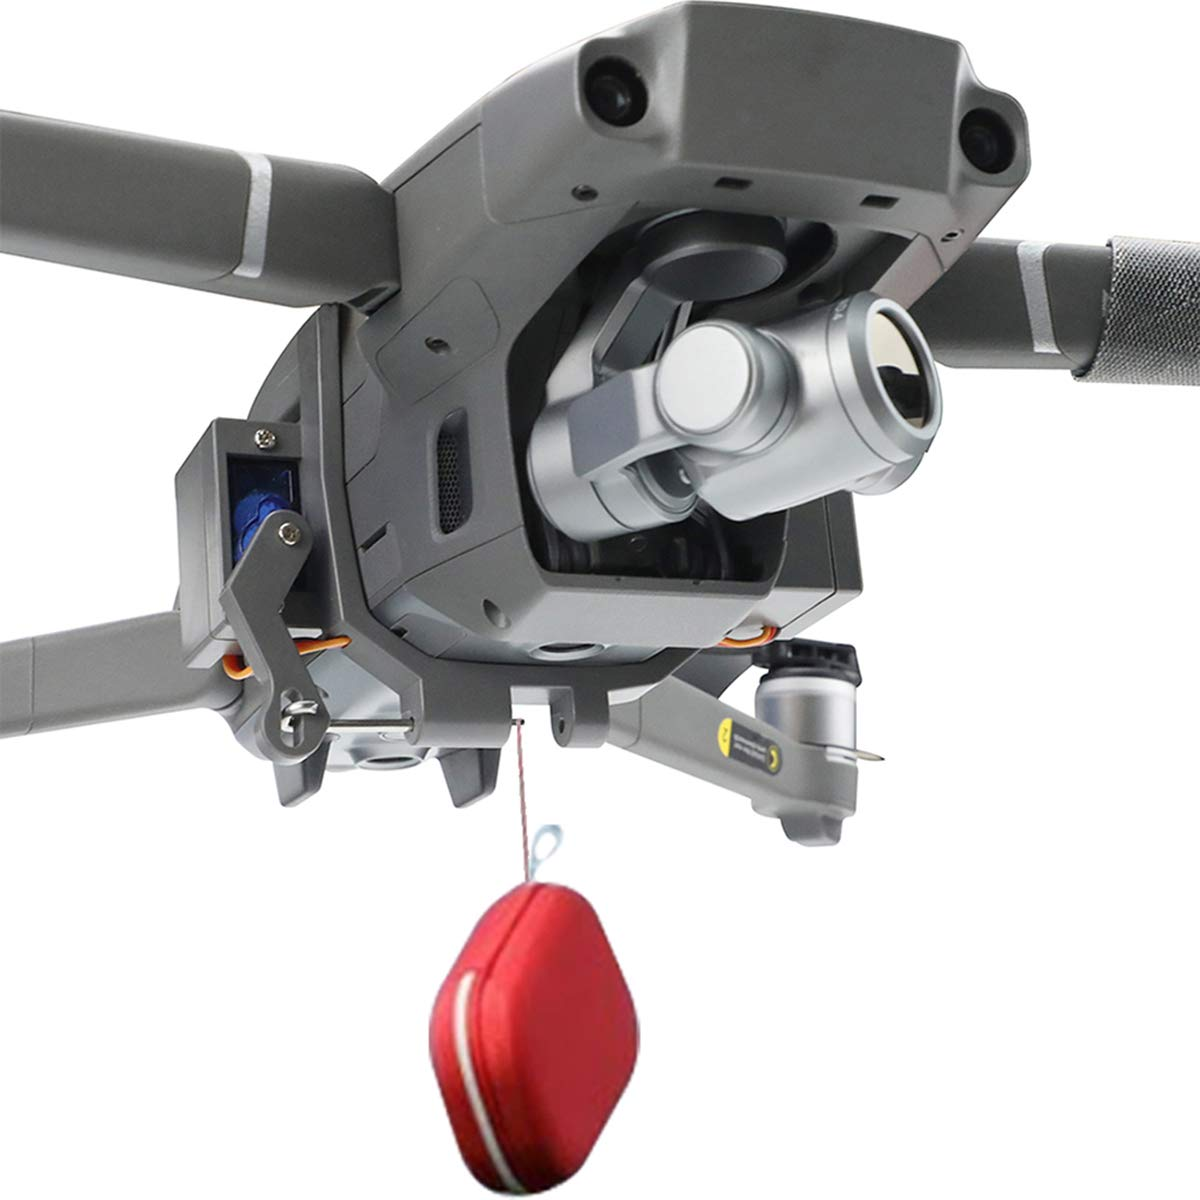 Owoda Mavic 2 Drone Clip Dispositivo de Transporte de Entrega de Carga útil Drone de Boda Cebo de Pesca Búsqueda y Rescate Compatible con Mavic 2 Pro ...